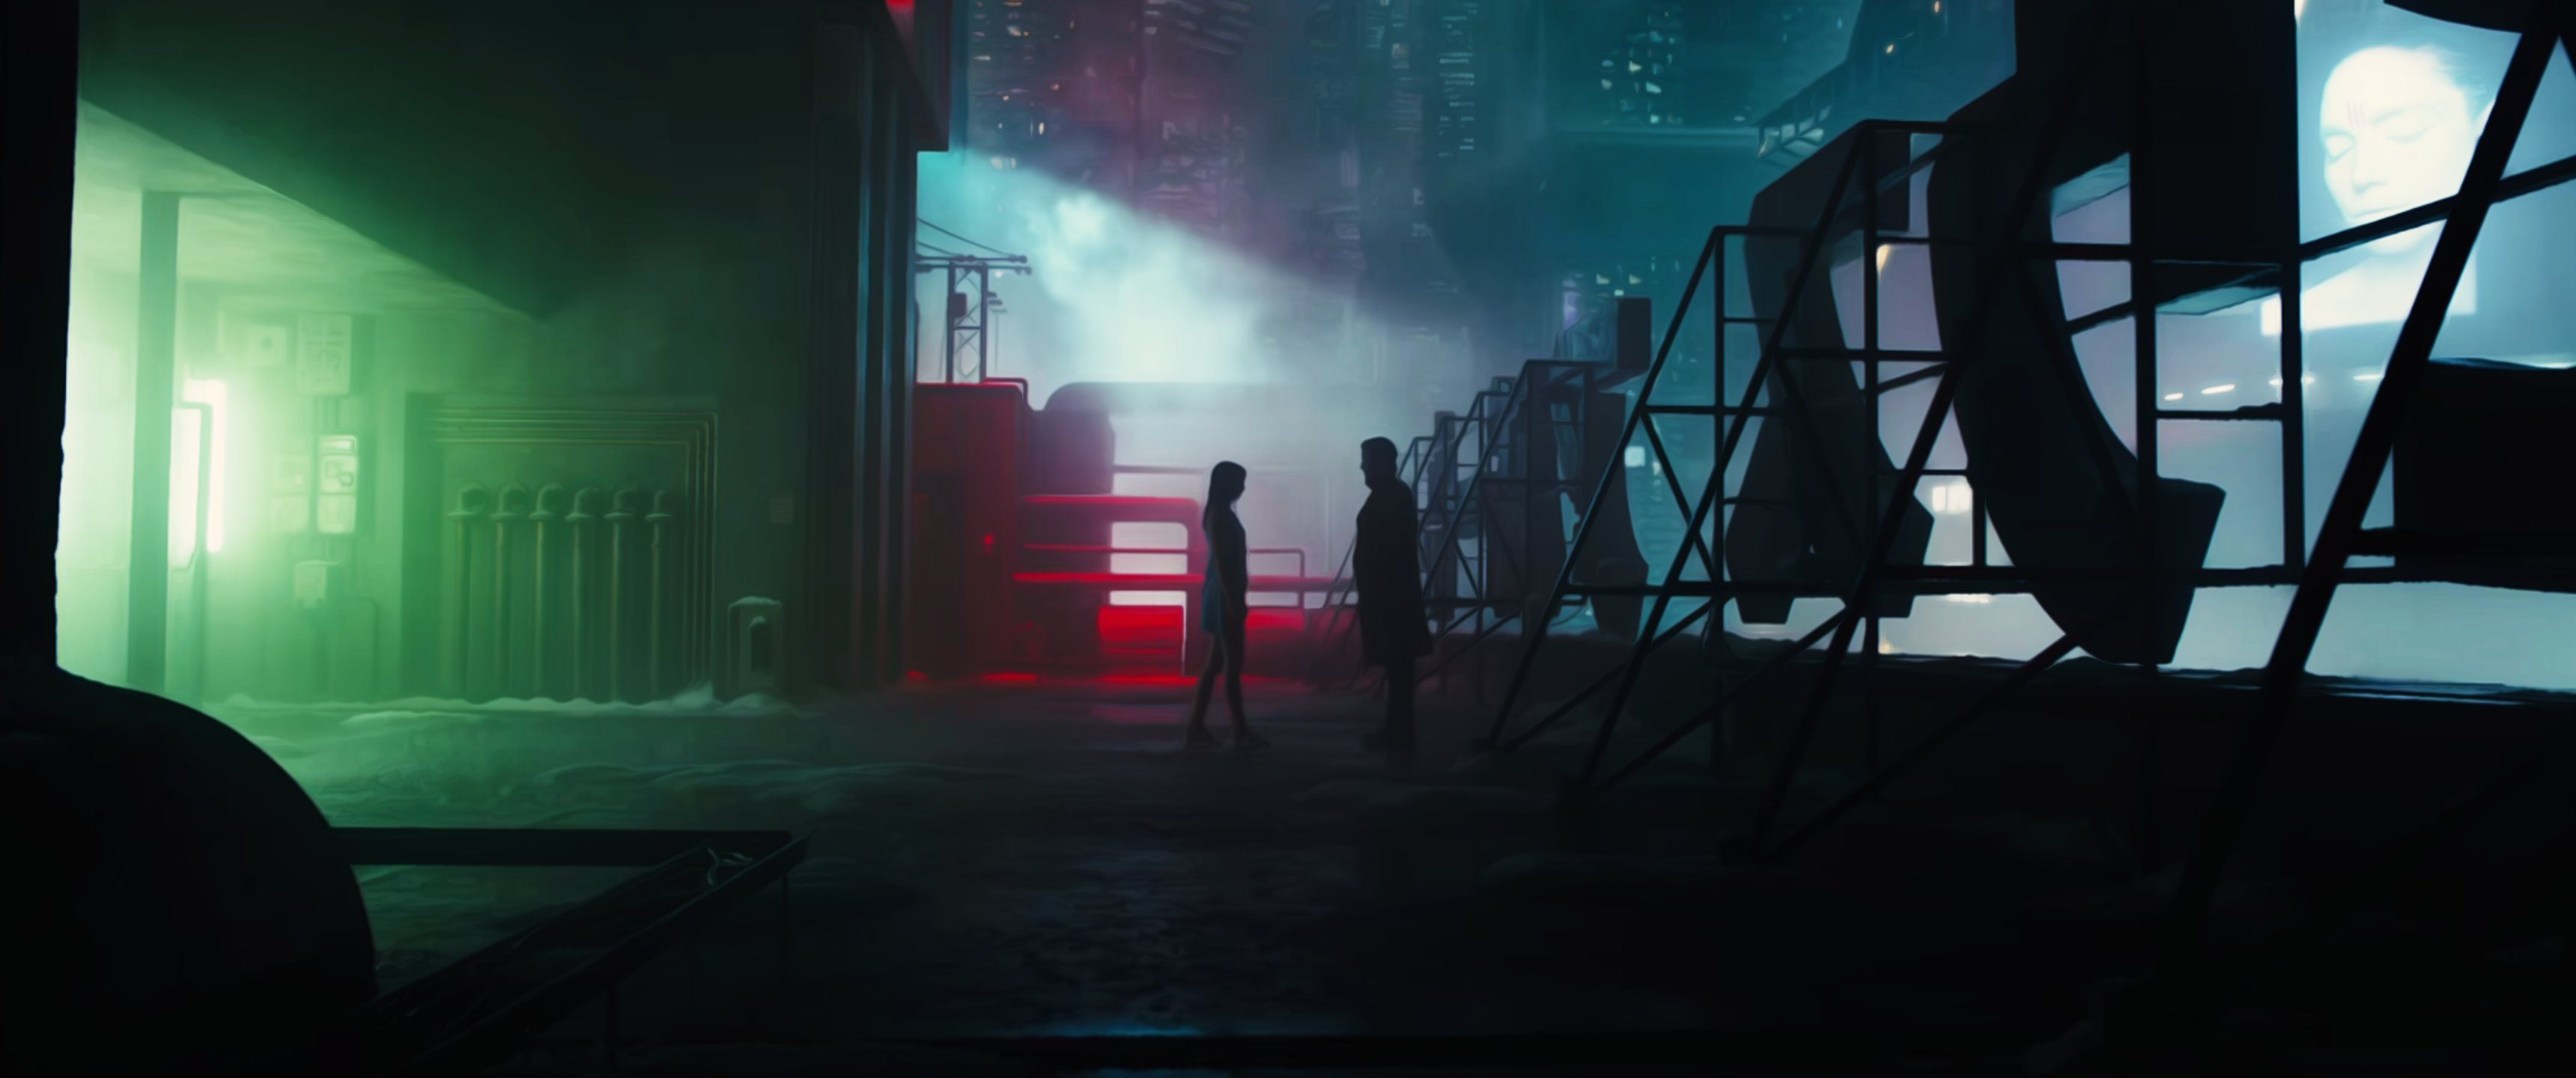 Blade Runner 2049 4k Wallpapers Top Free Blade Runner 2049 4k Backgrounds Wallpaperaccess Blade Runner 2049 Blade Runner Wallpaper Blade Runner